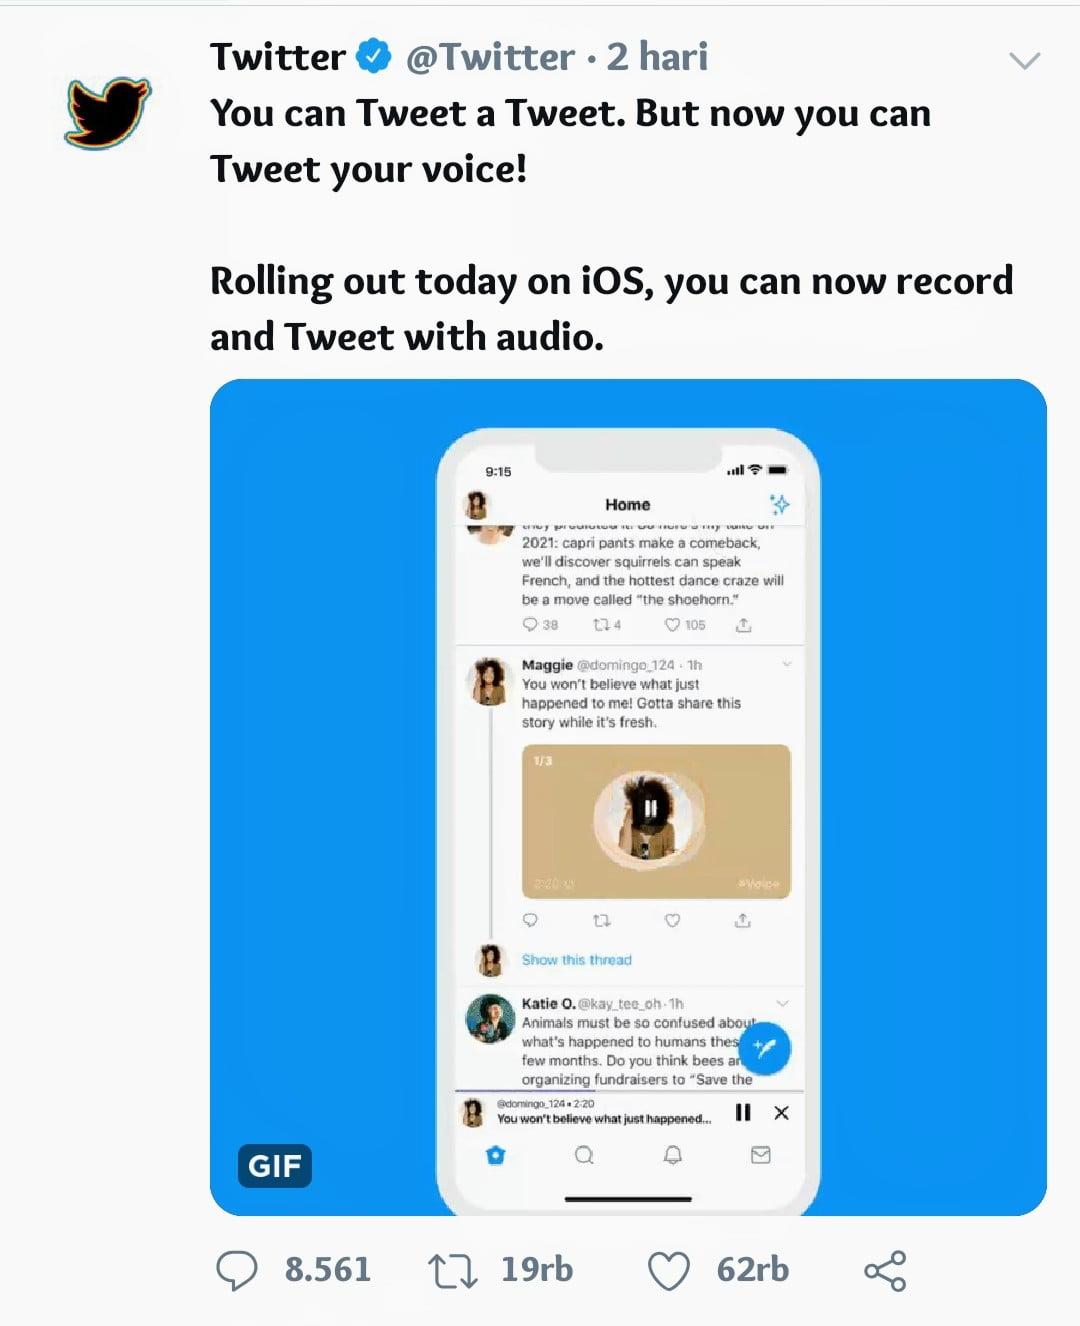 Kelebihan Fitur Tweet Audio di Twitter